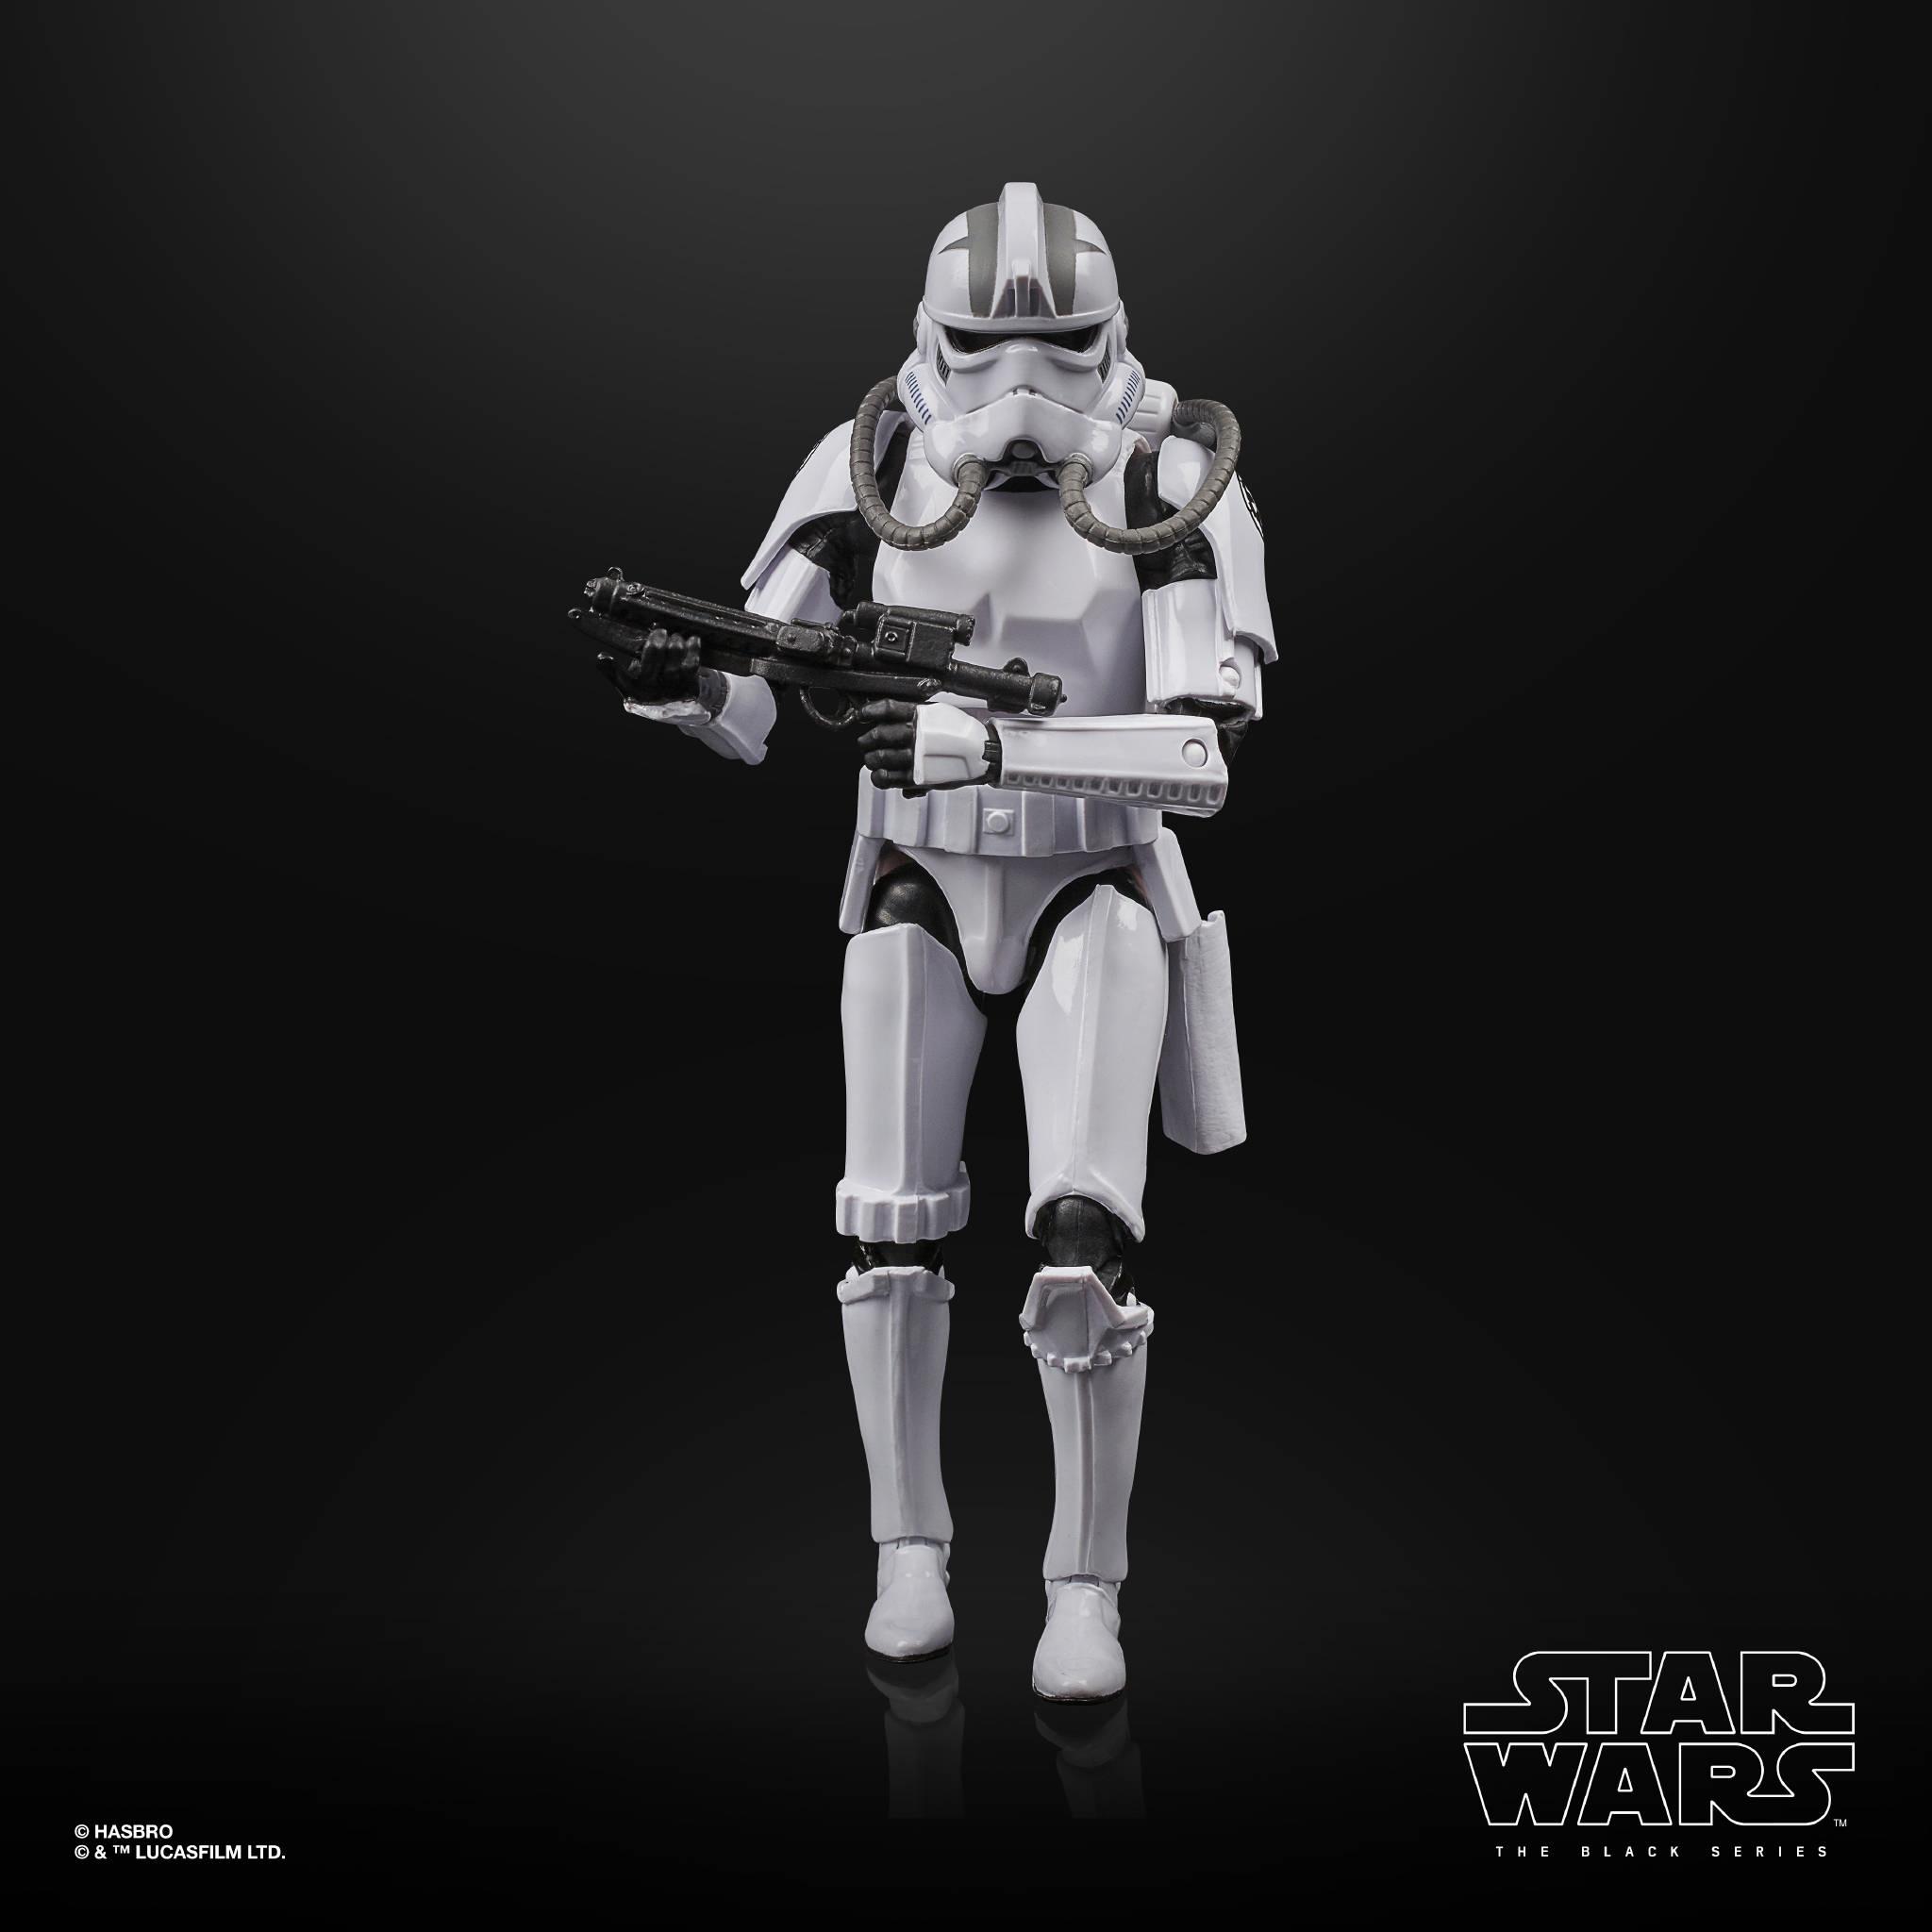 Star Wars The Black Series Gaming Greats Imperial Rocket Trooper F2819 5010993873494